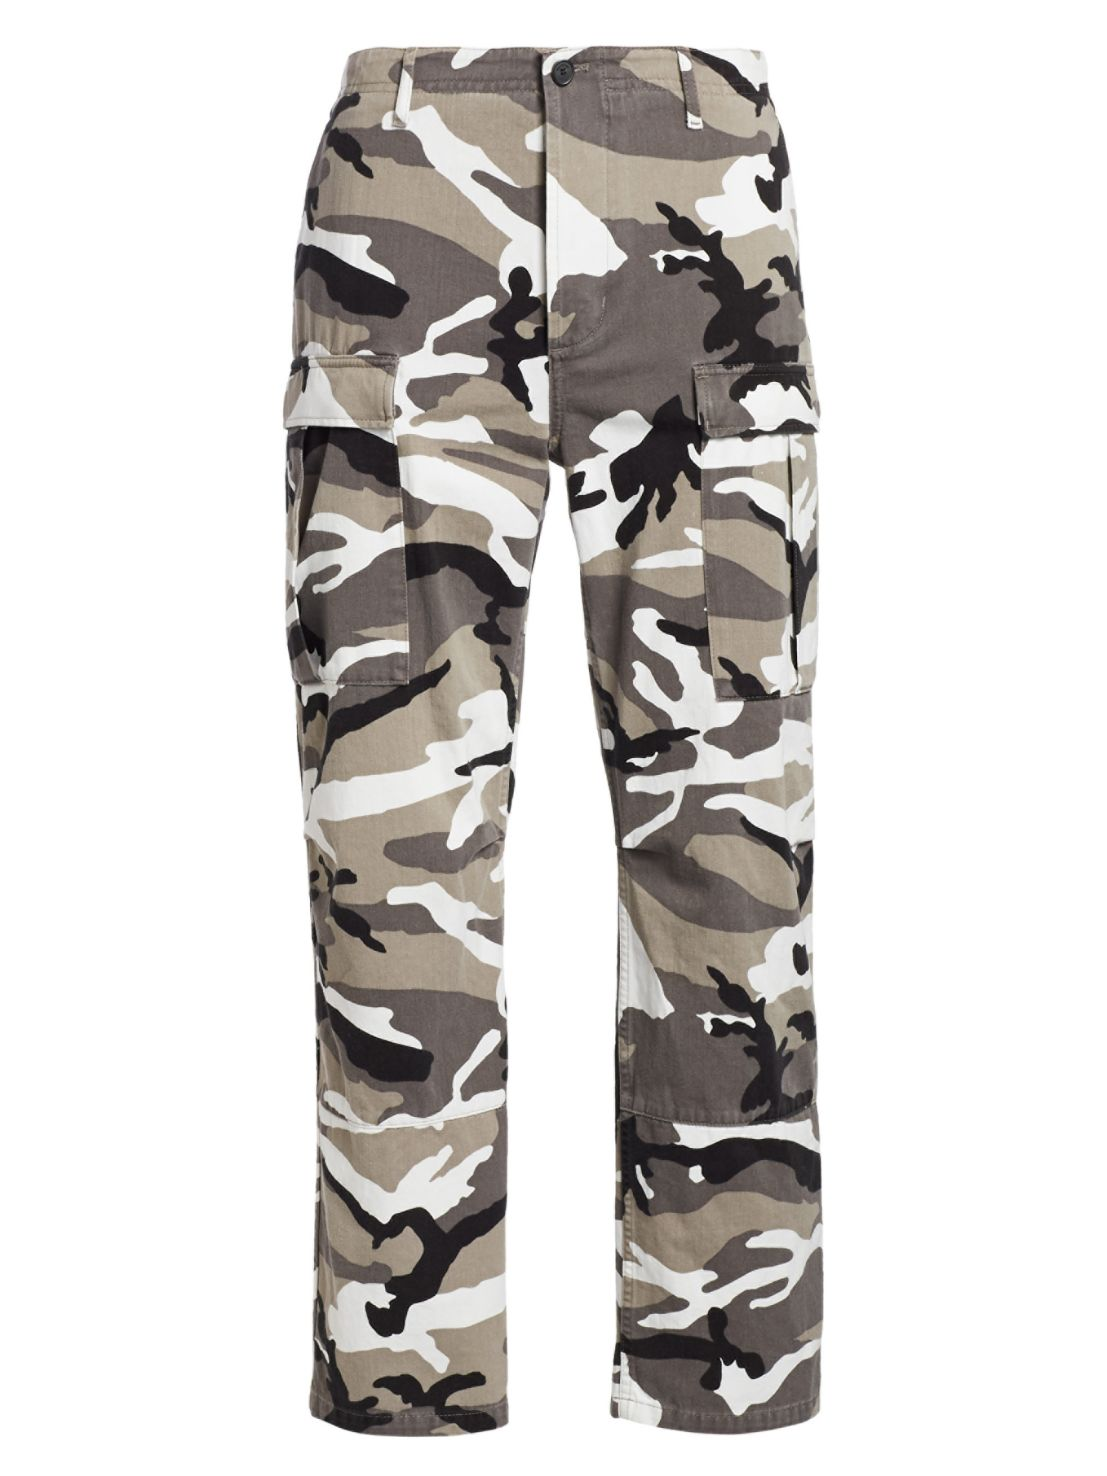 www.prepcoterie.com Premium clothing garments and supplies meet high  fashion . Prep, Kim Kardashian, Trump, Kanye West, Denim, Camo, Shorts,  Army,.